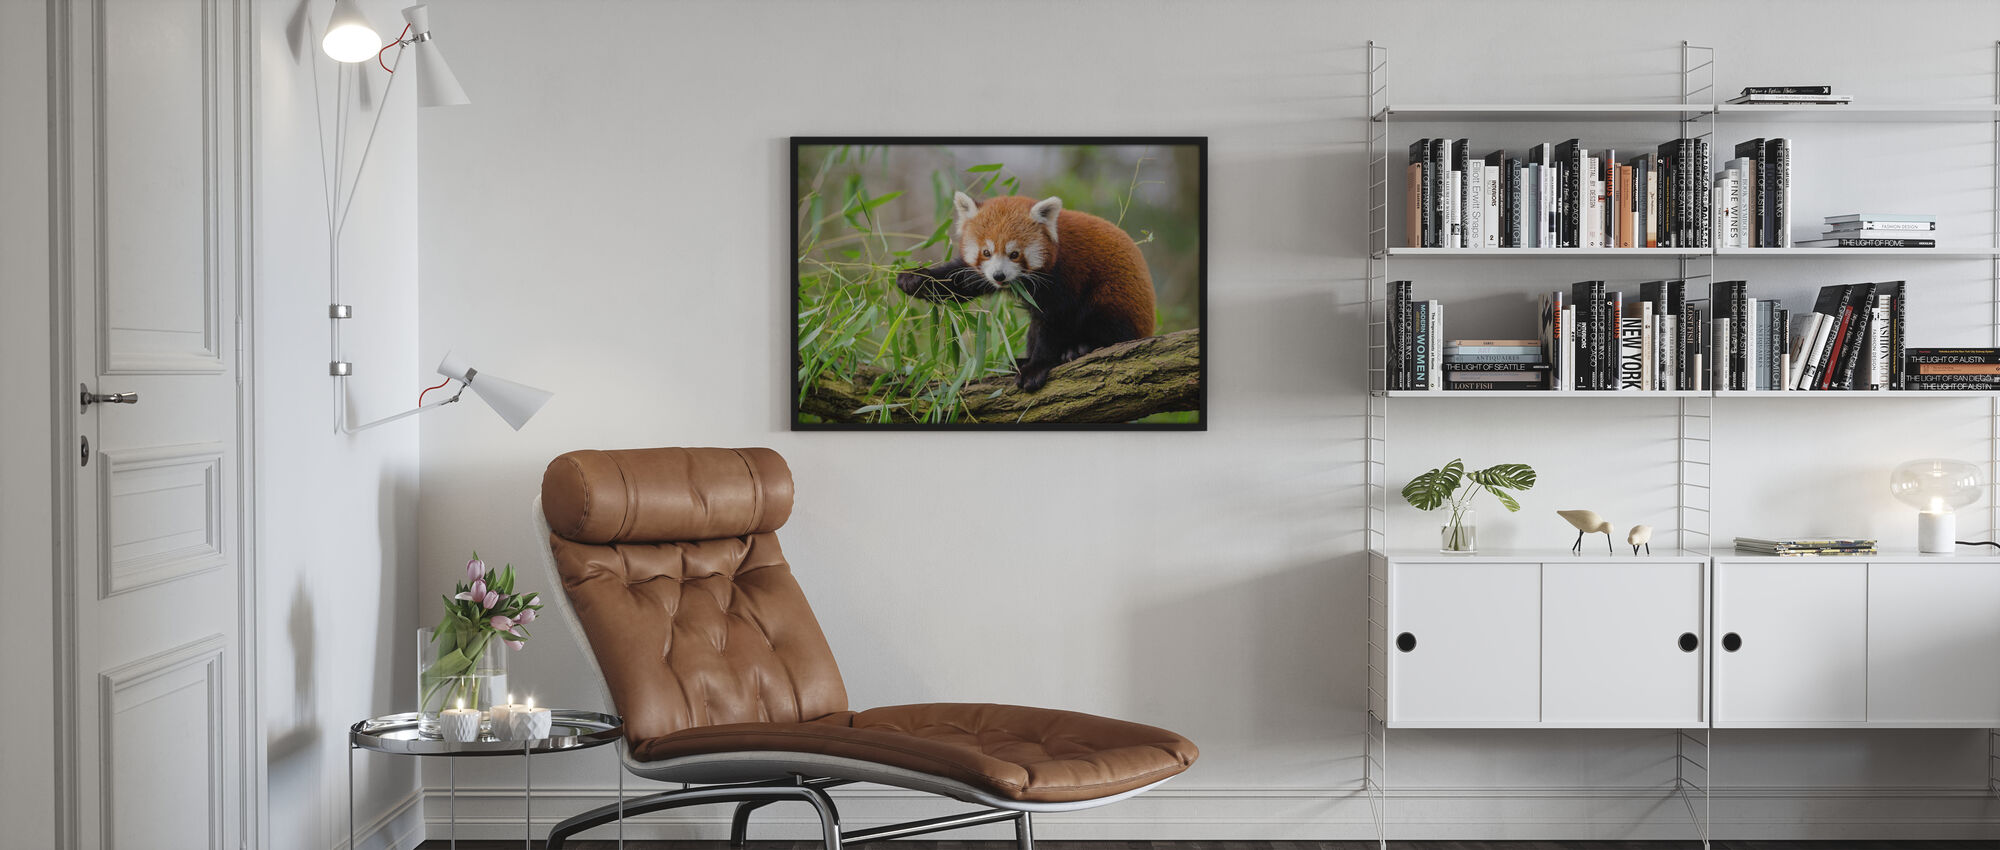 Lilla Röd Panda - Poster - Vardagsrum